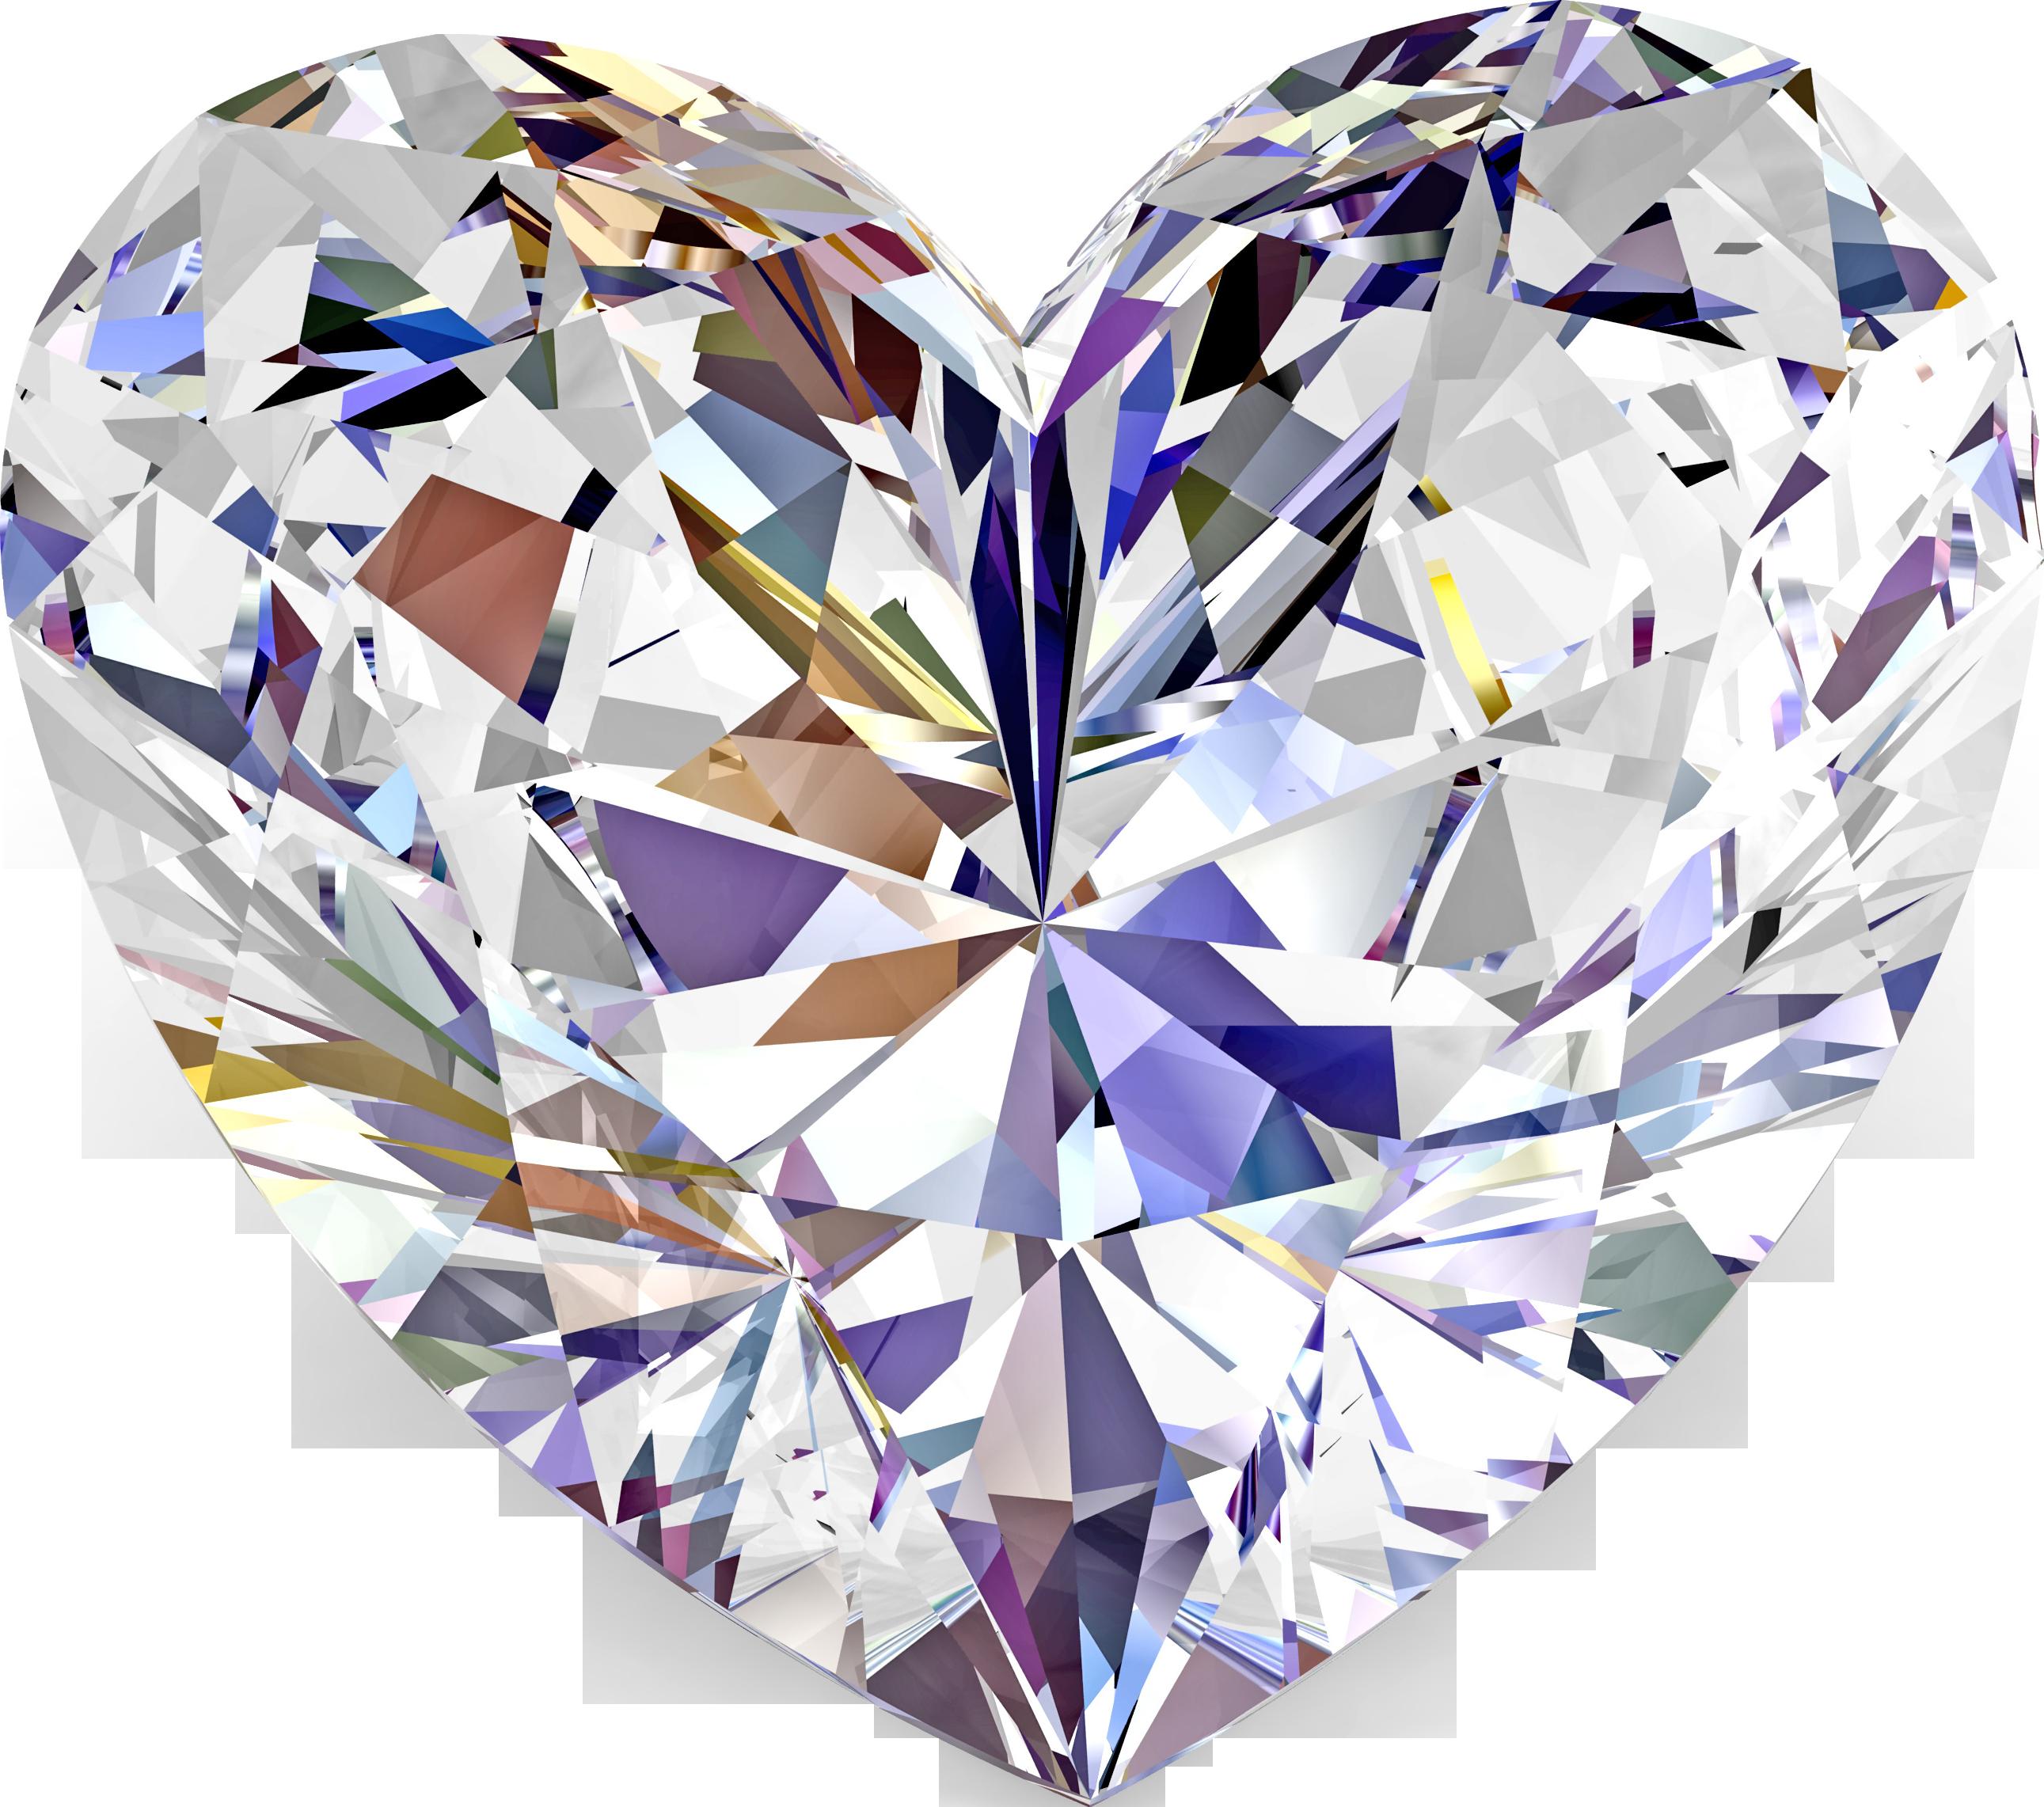 lenagold ru color. Diamonds clipart mineral